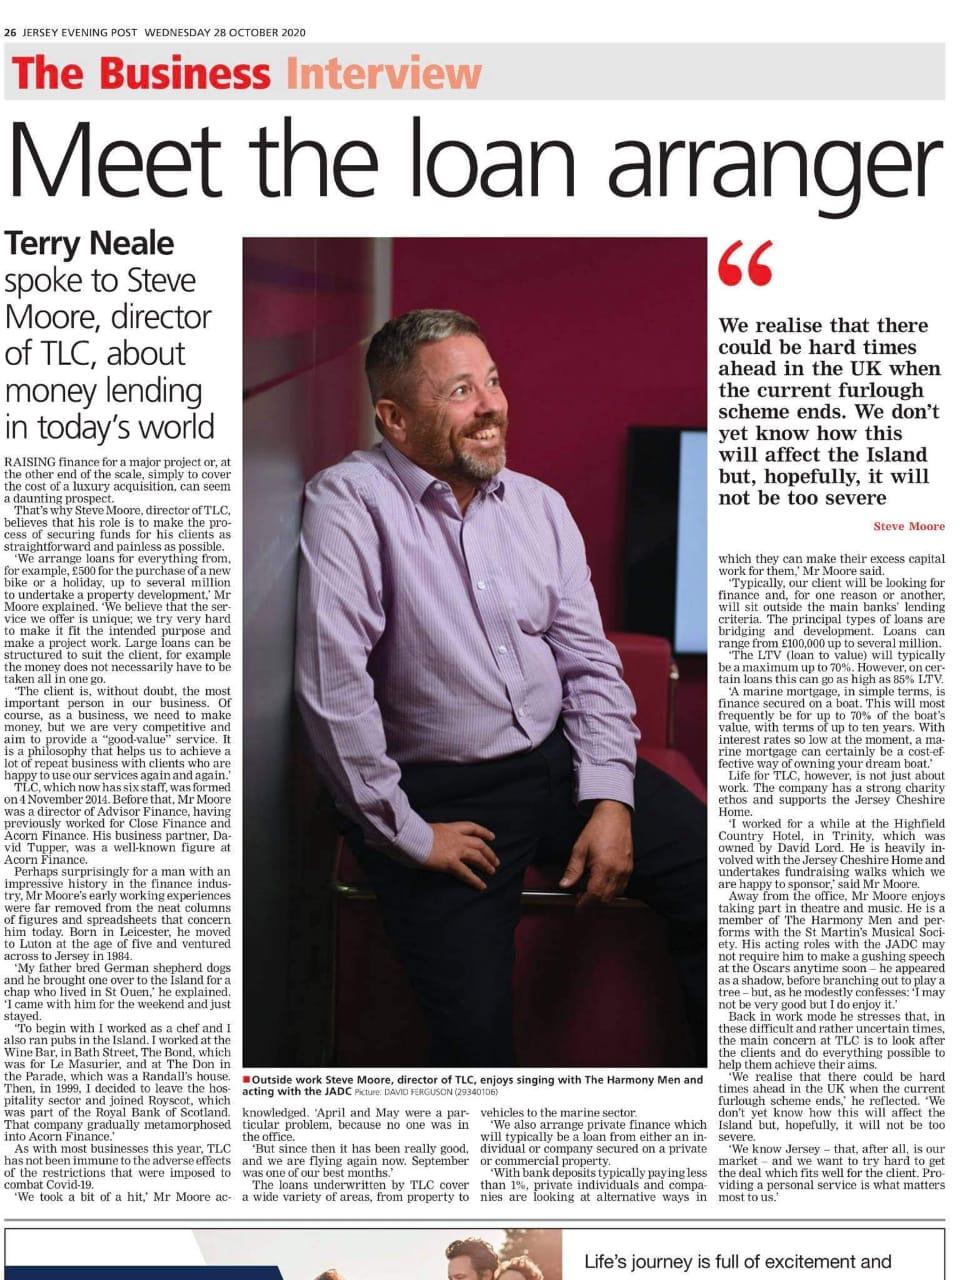 Steve Moore: Loan Arranger